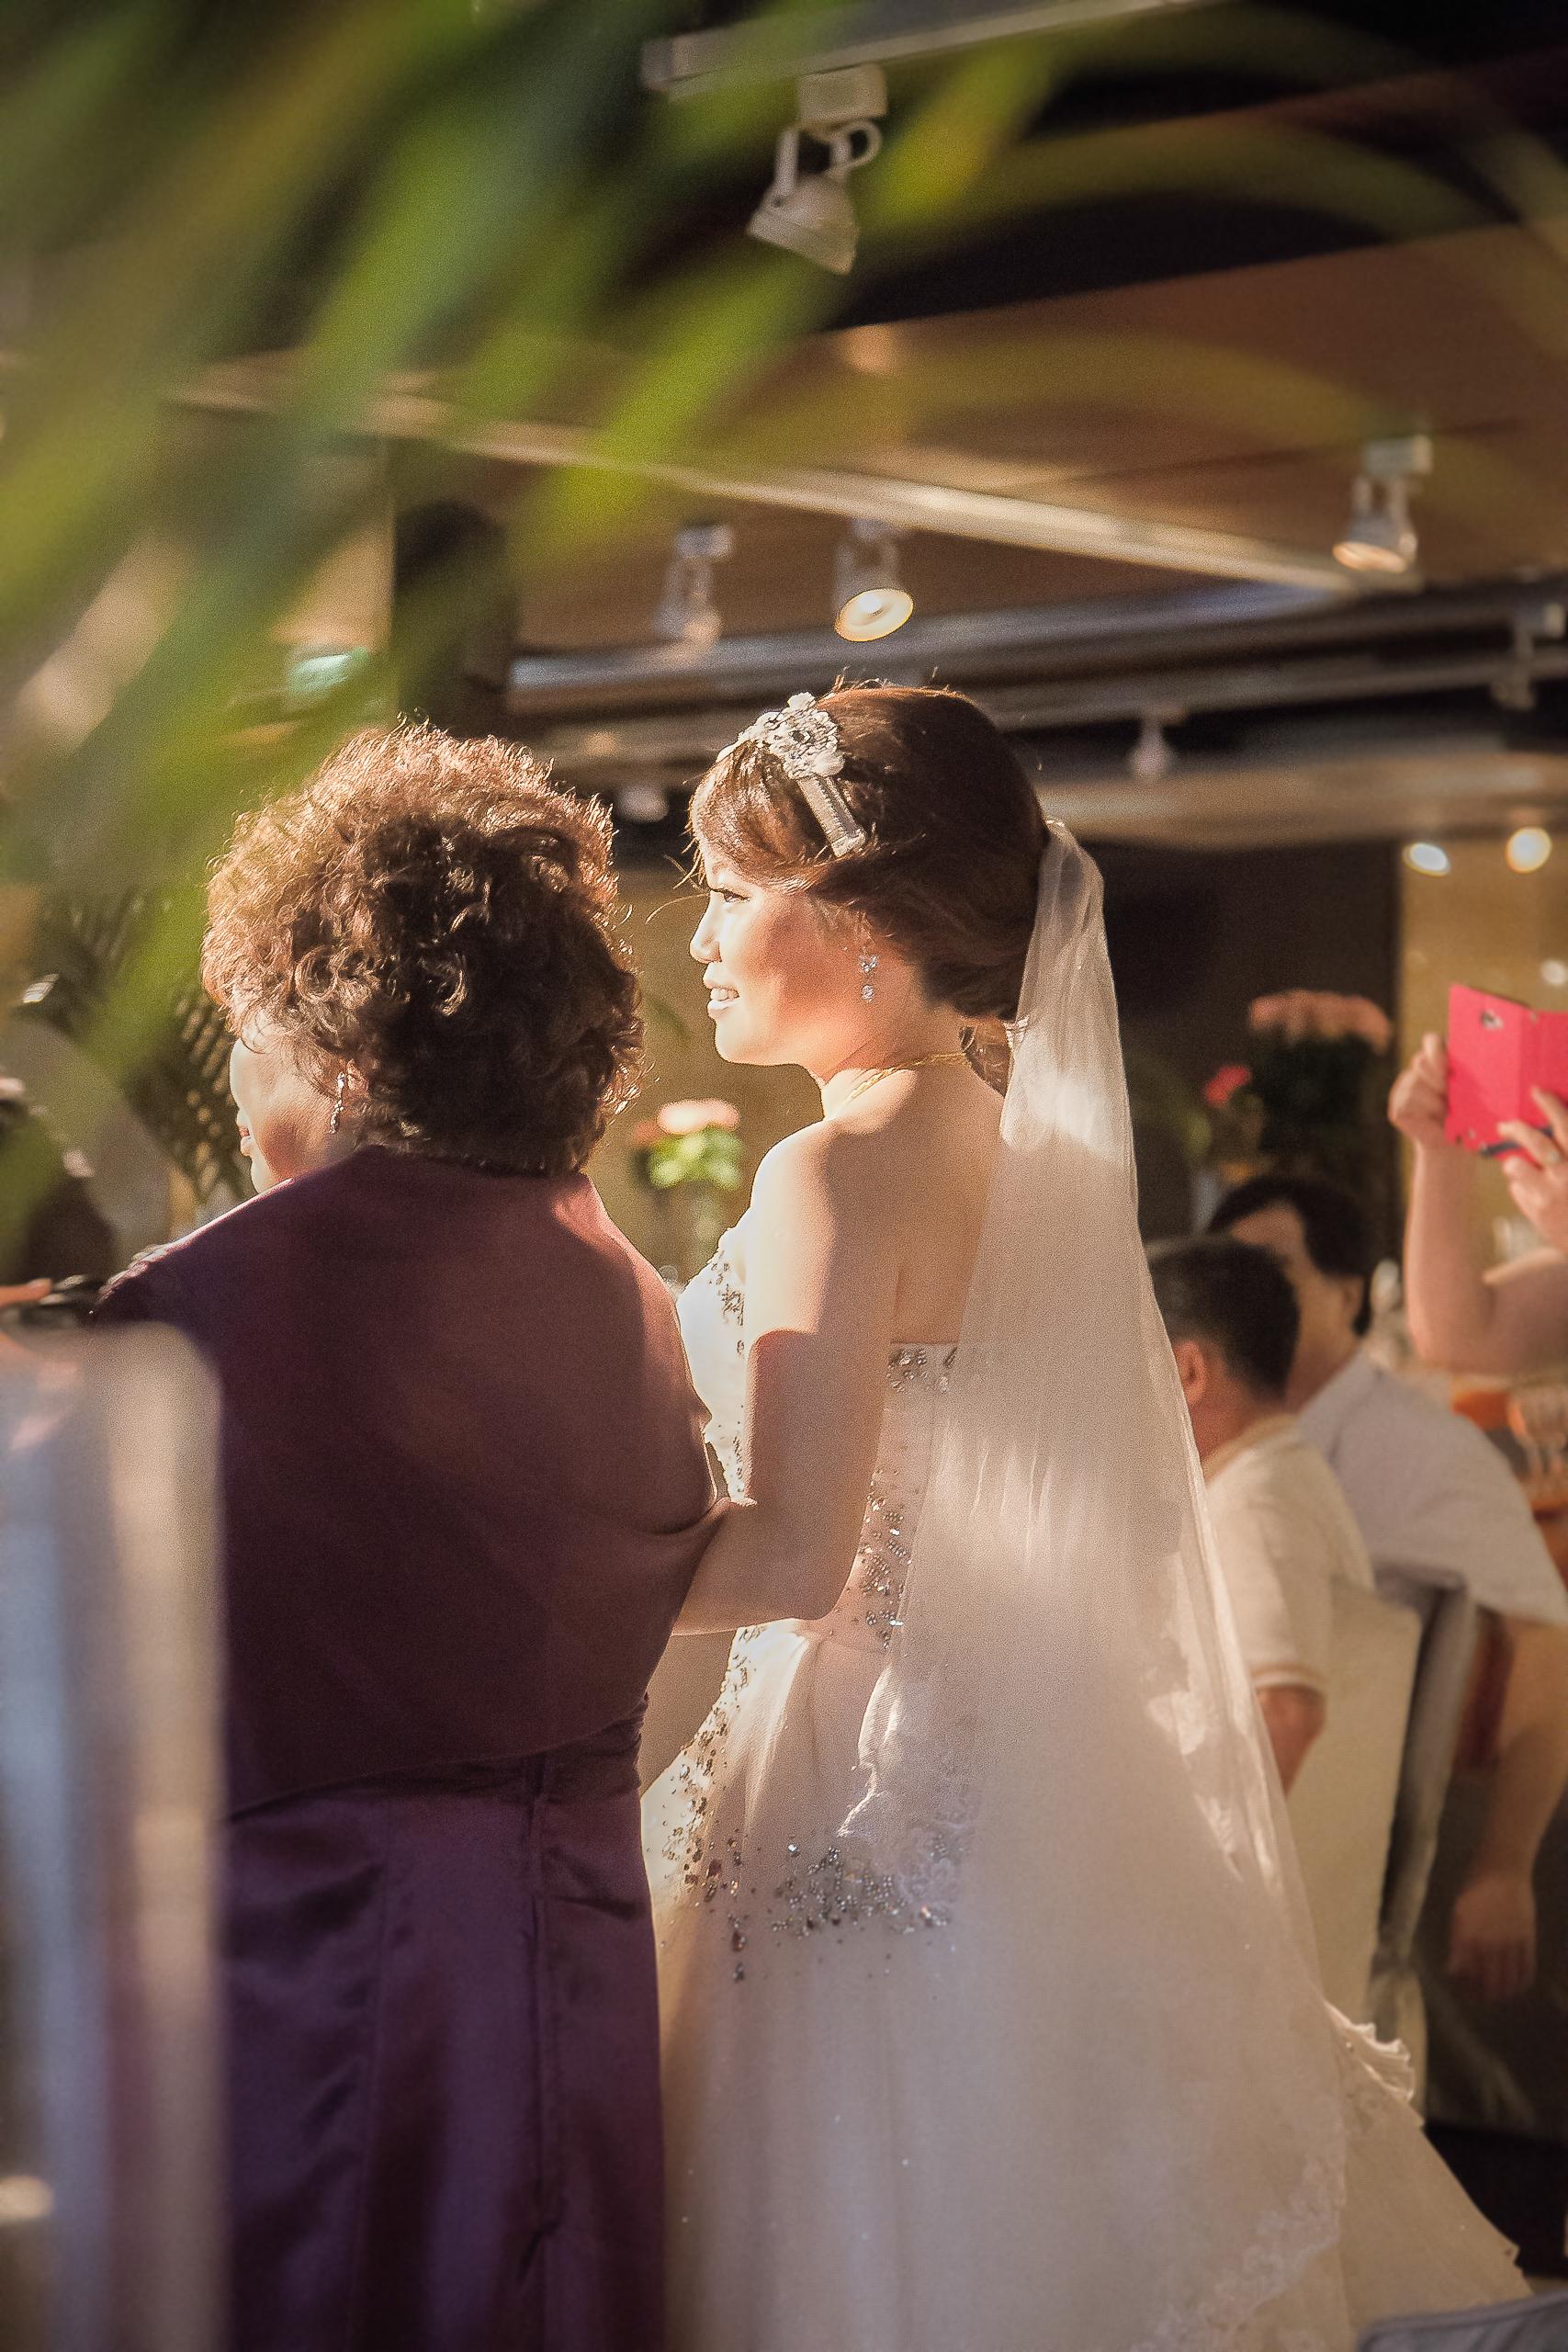 Wedding-婚攝Q比-酷比攝影-CUBY-PHOTOGRAPHY-台北僑園飯店-09